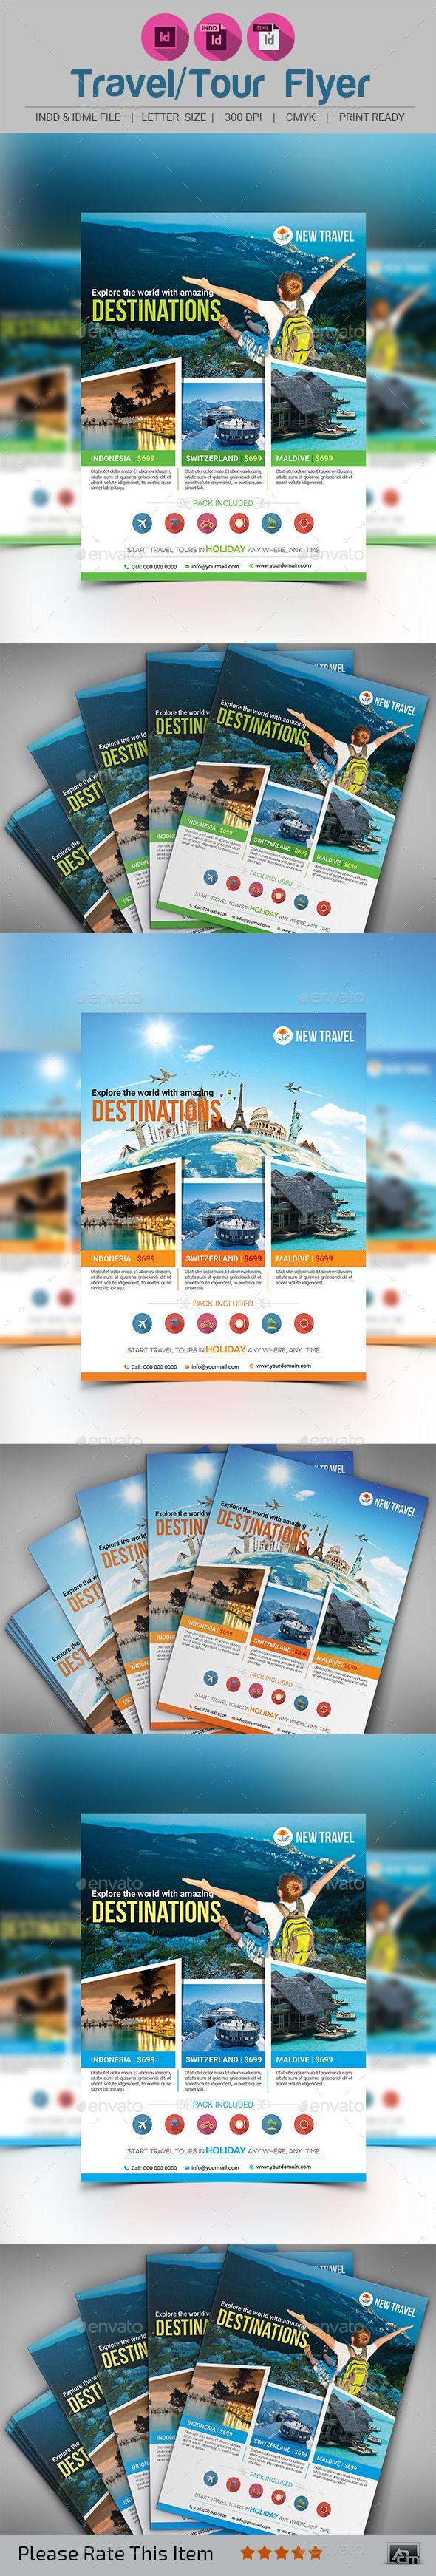 Holiday Traveltour Flyer Template Pinterest Flyer Template